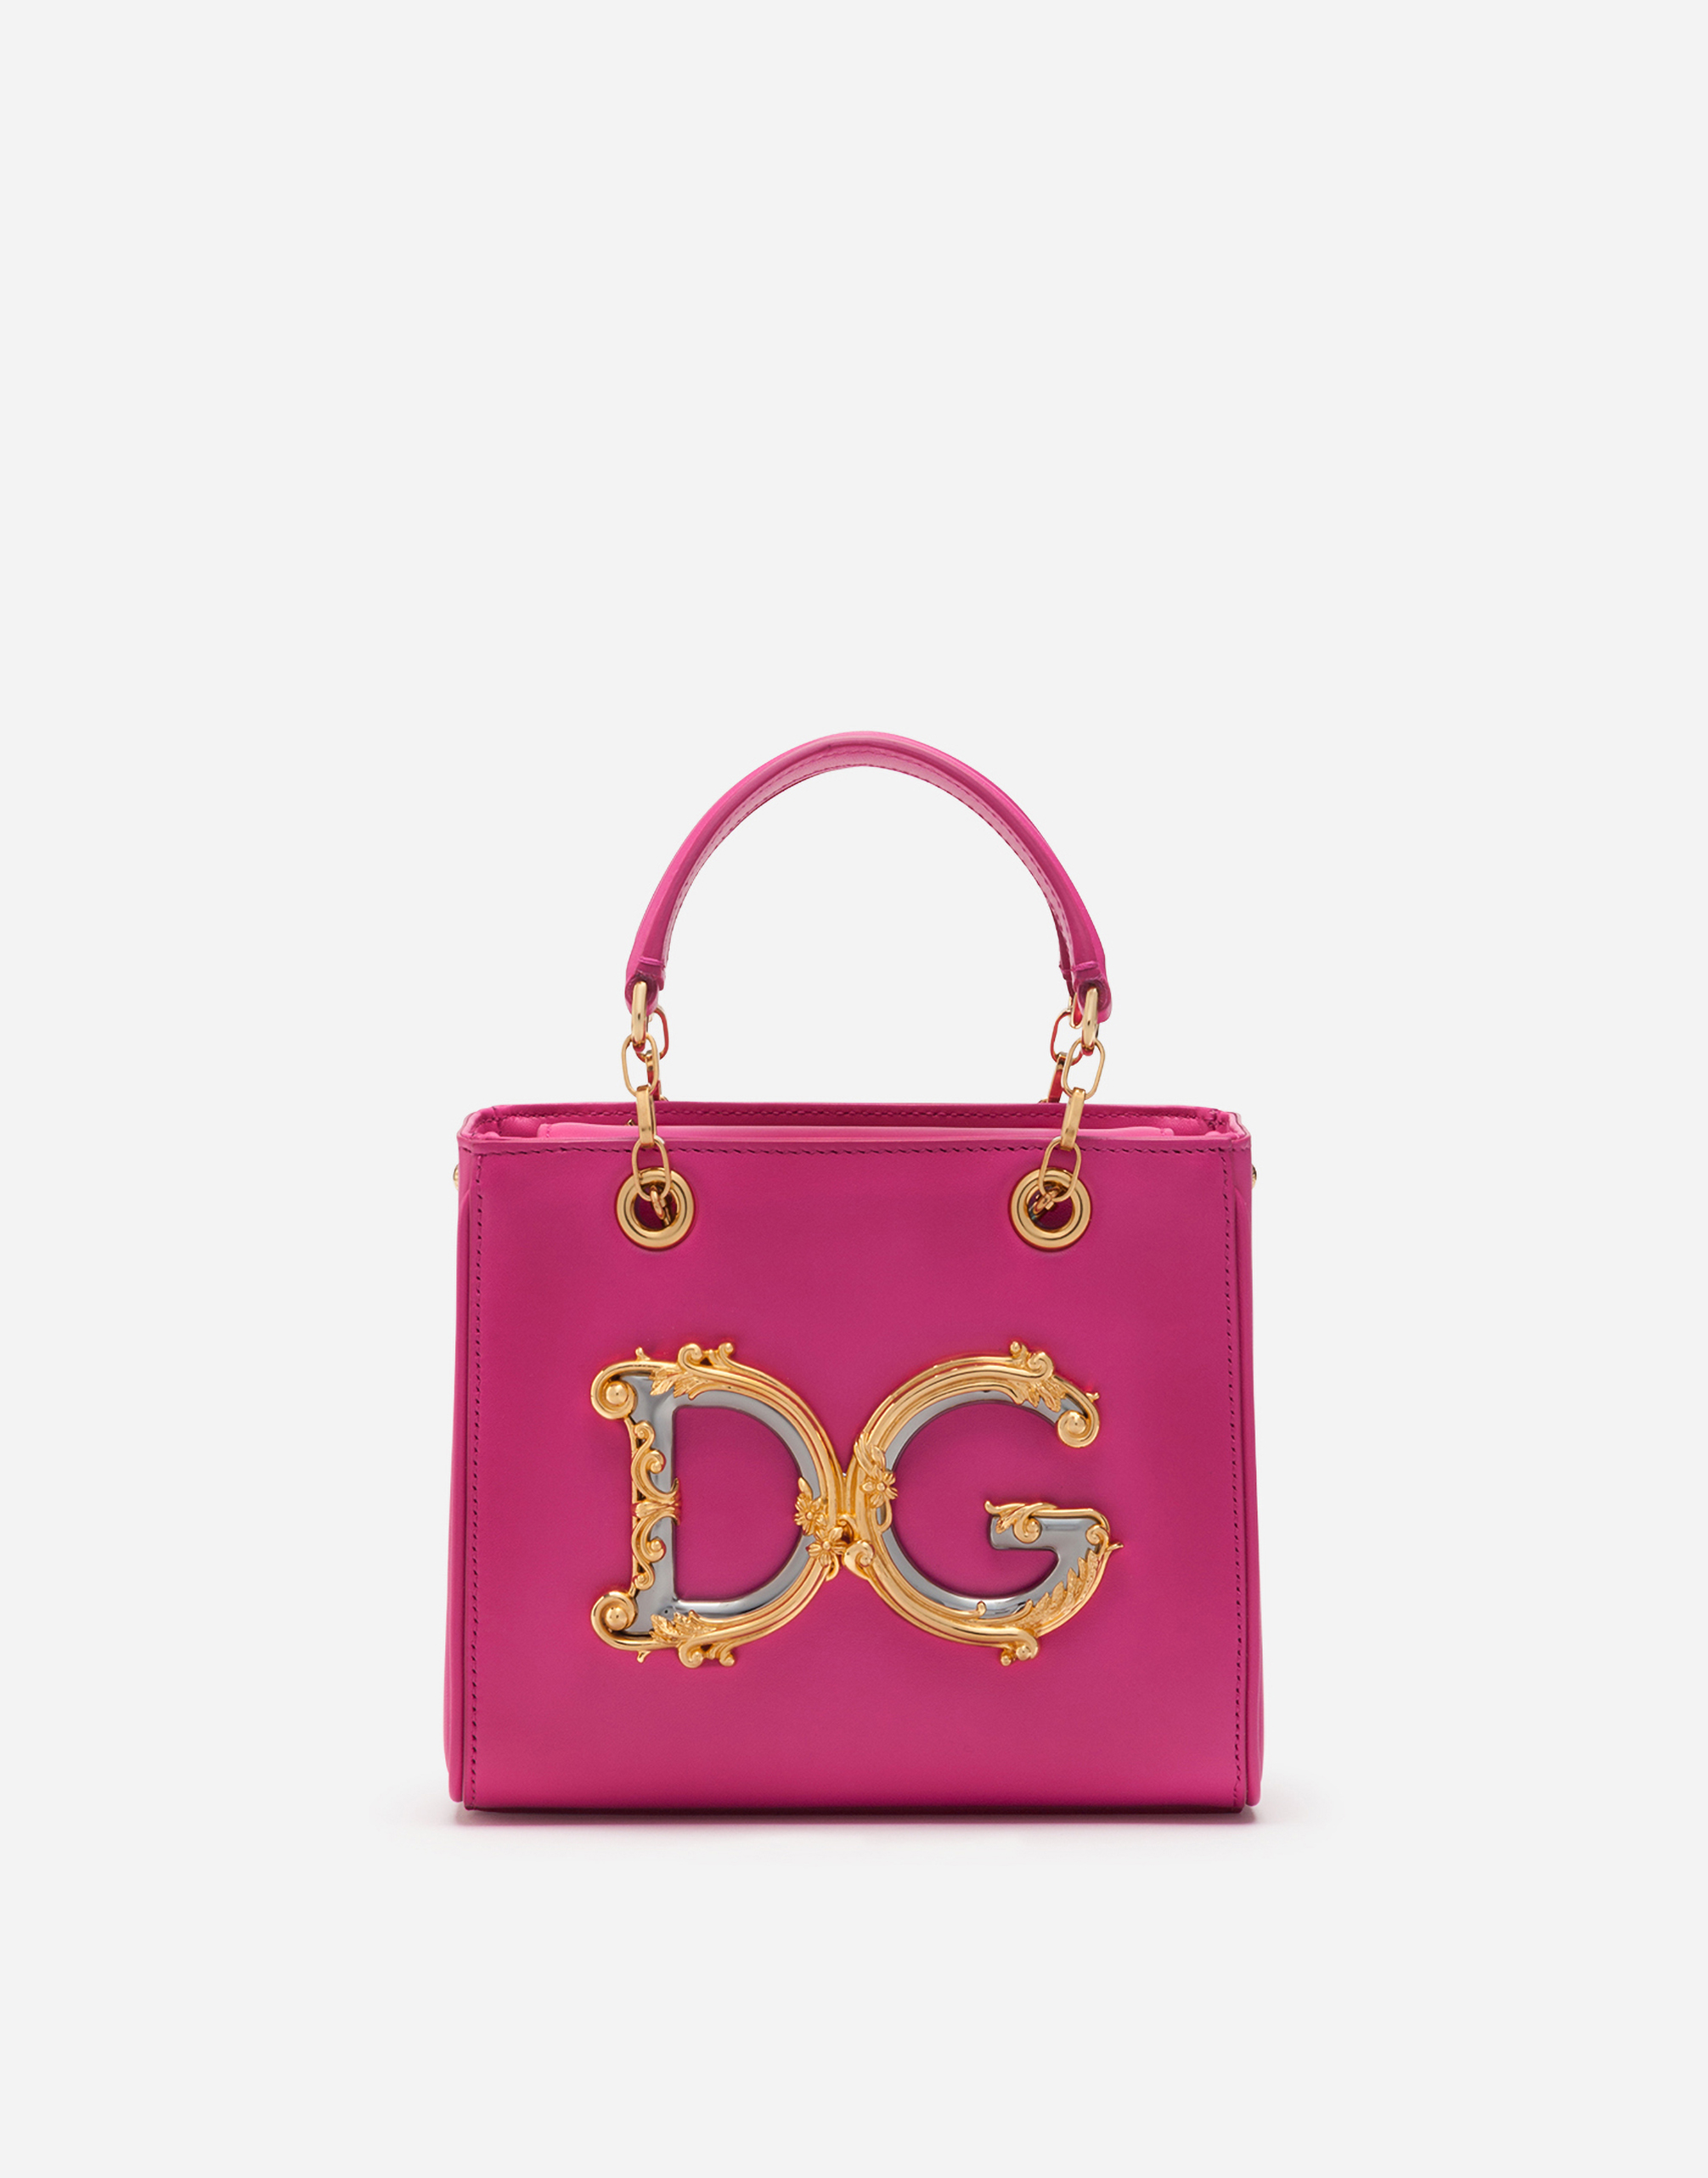 Women's Shoulder and Crossbody Bags   Dolce&Gabbana